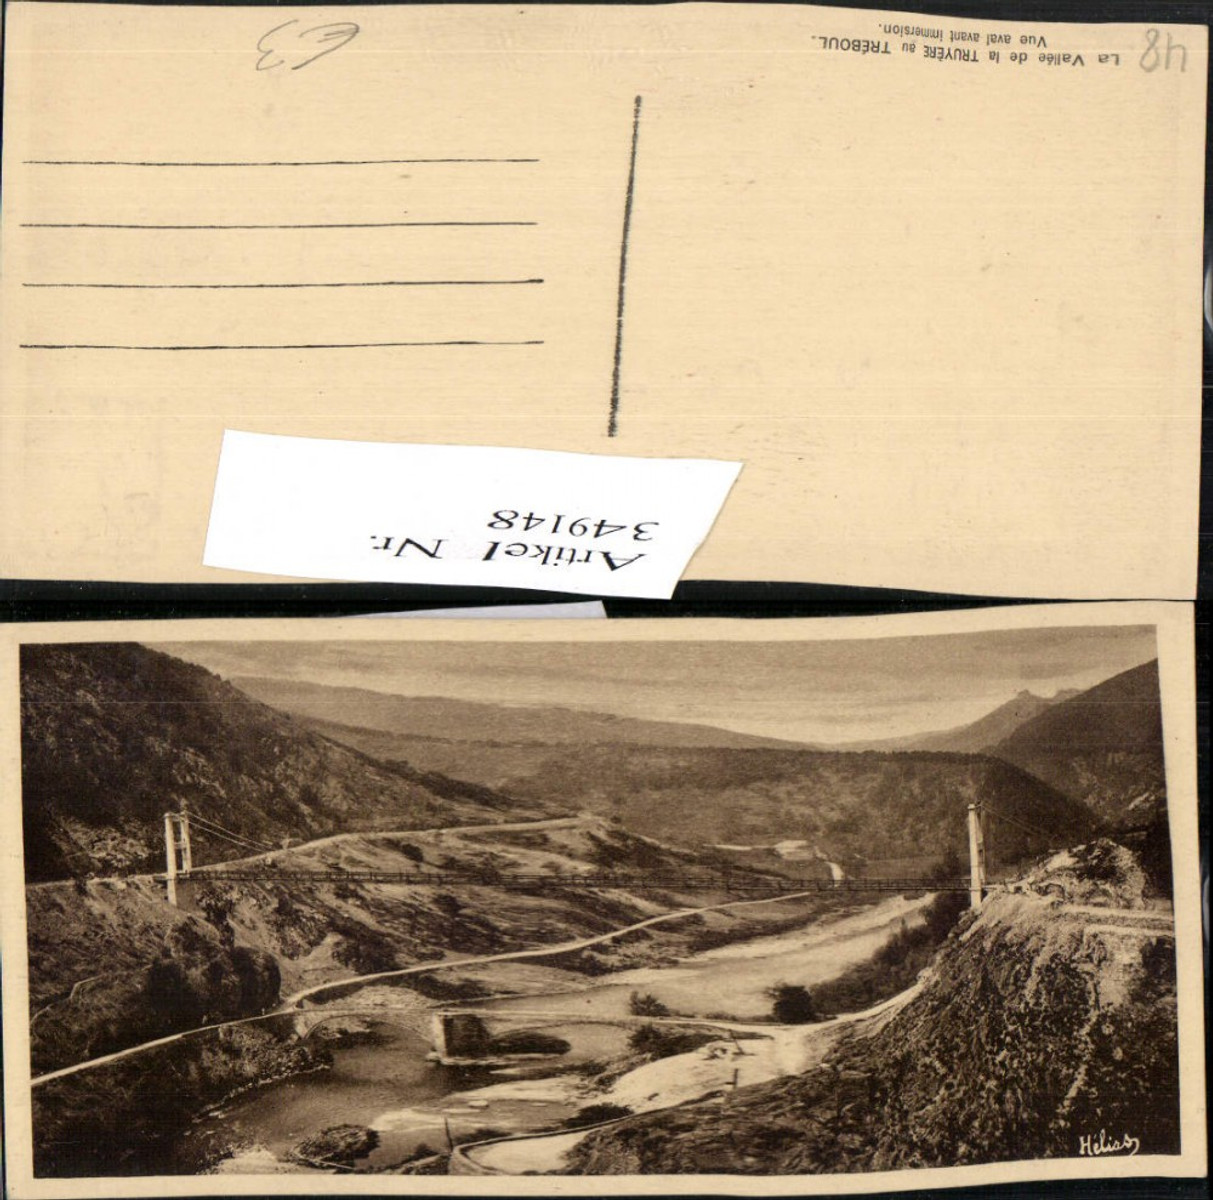 349148,Languedoc-Roussillon Lozere Vallee de la Truyere au Treboul Brücke günstig online kaufen